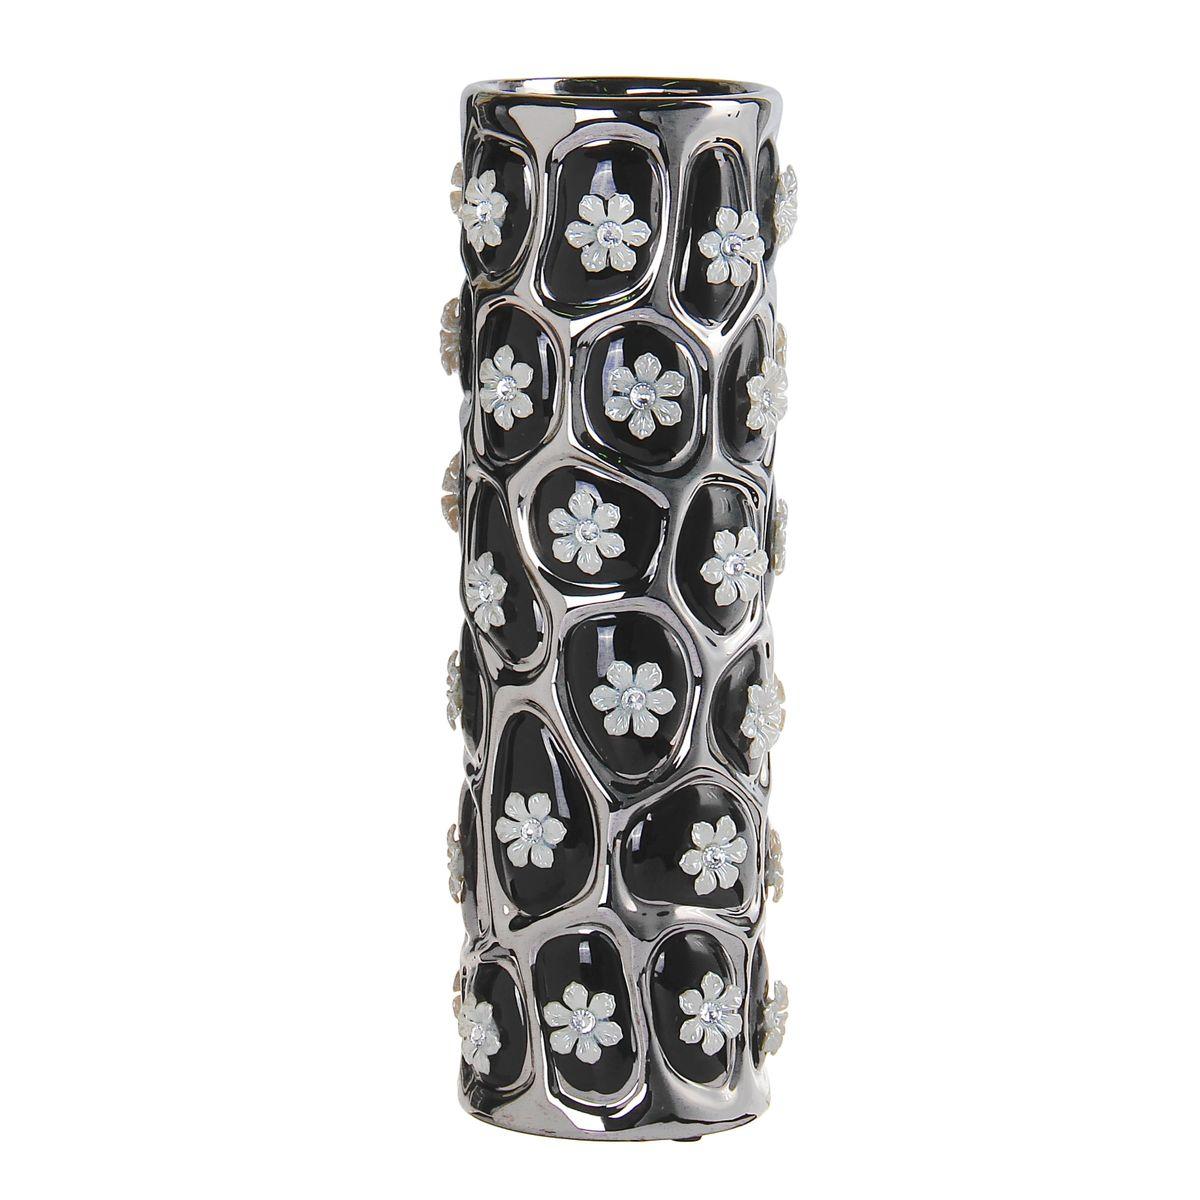 Ваза Цветочный орнамент, цвет: черный, 32 х 10 х 10 см. 866190 ваза d16 5 см х h24 см